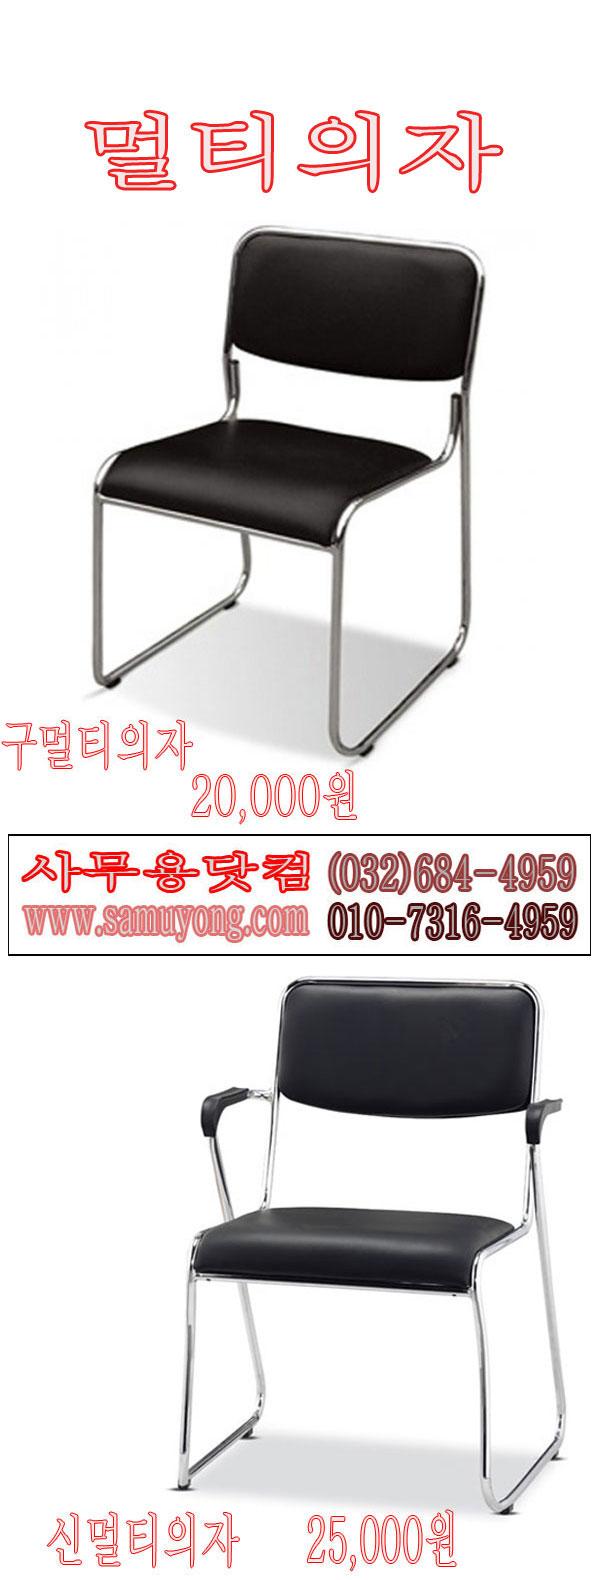 x2500.jpg